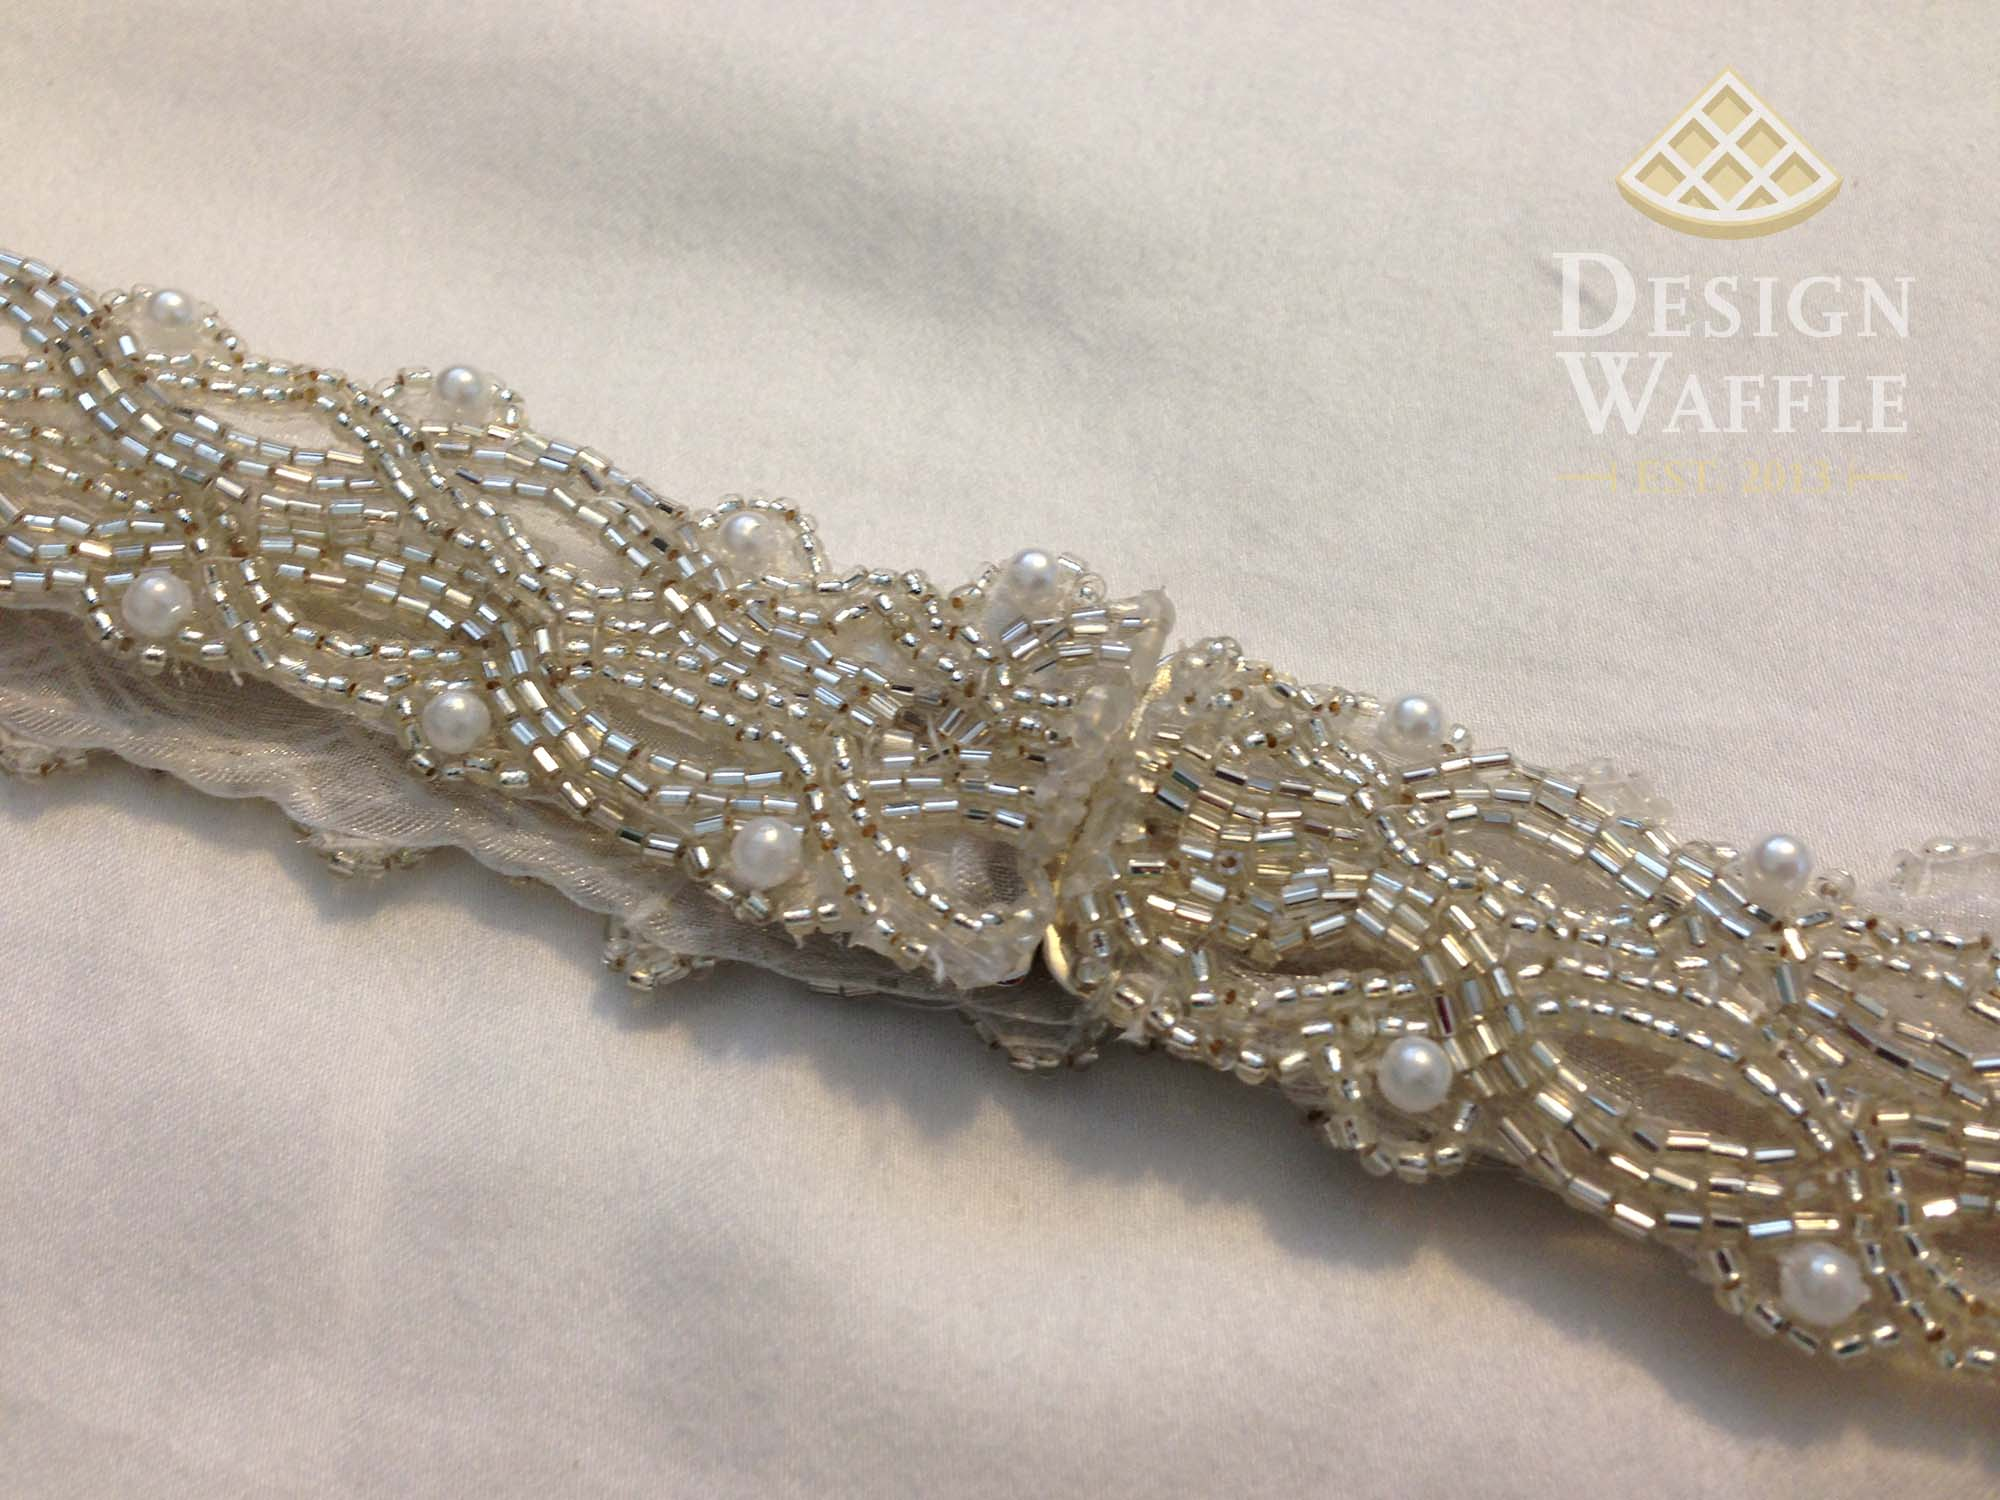 Diy beaded wedding belt design waffle diy beaded wedding belt tutorial solutioingenieria Gallery